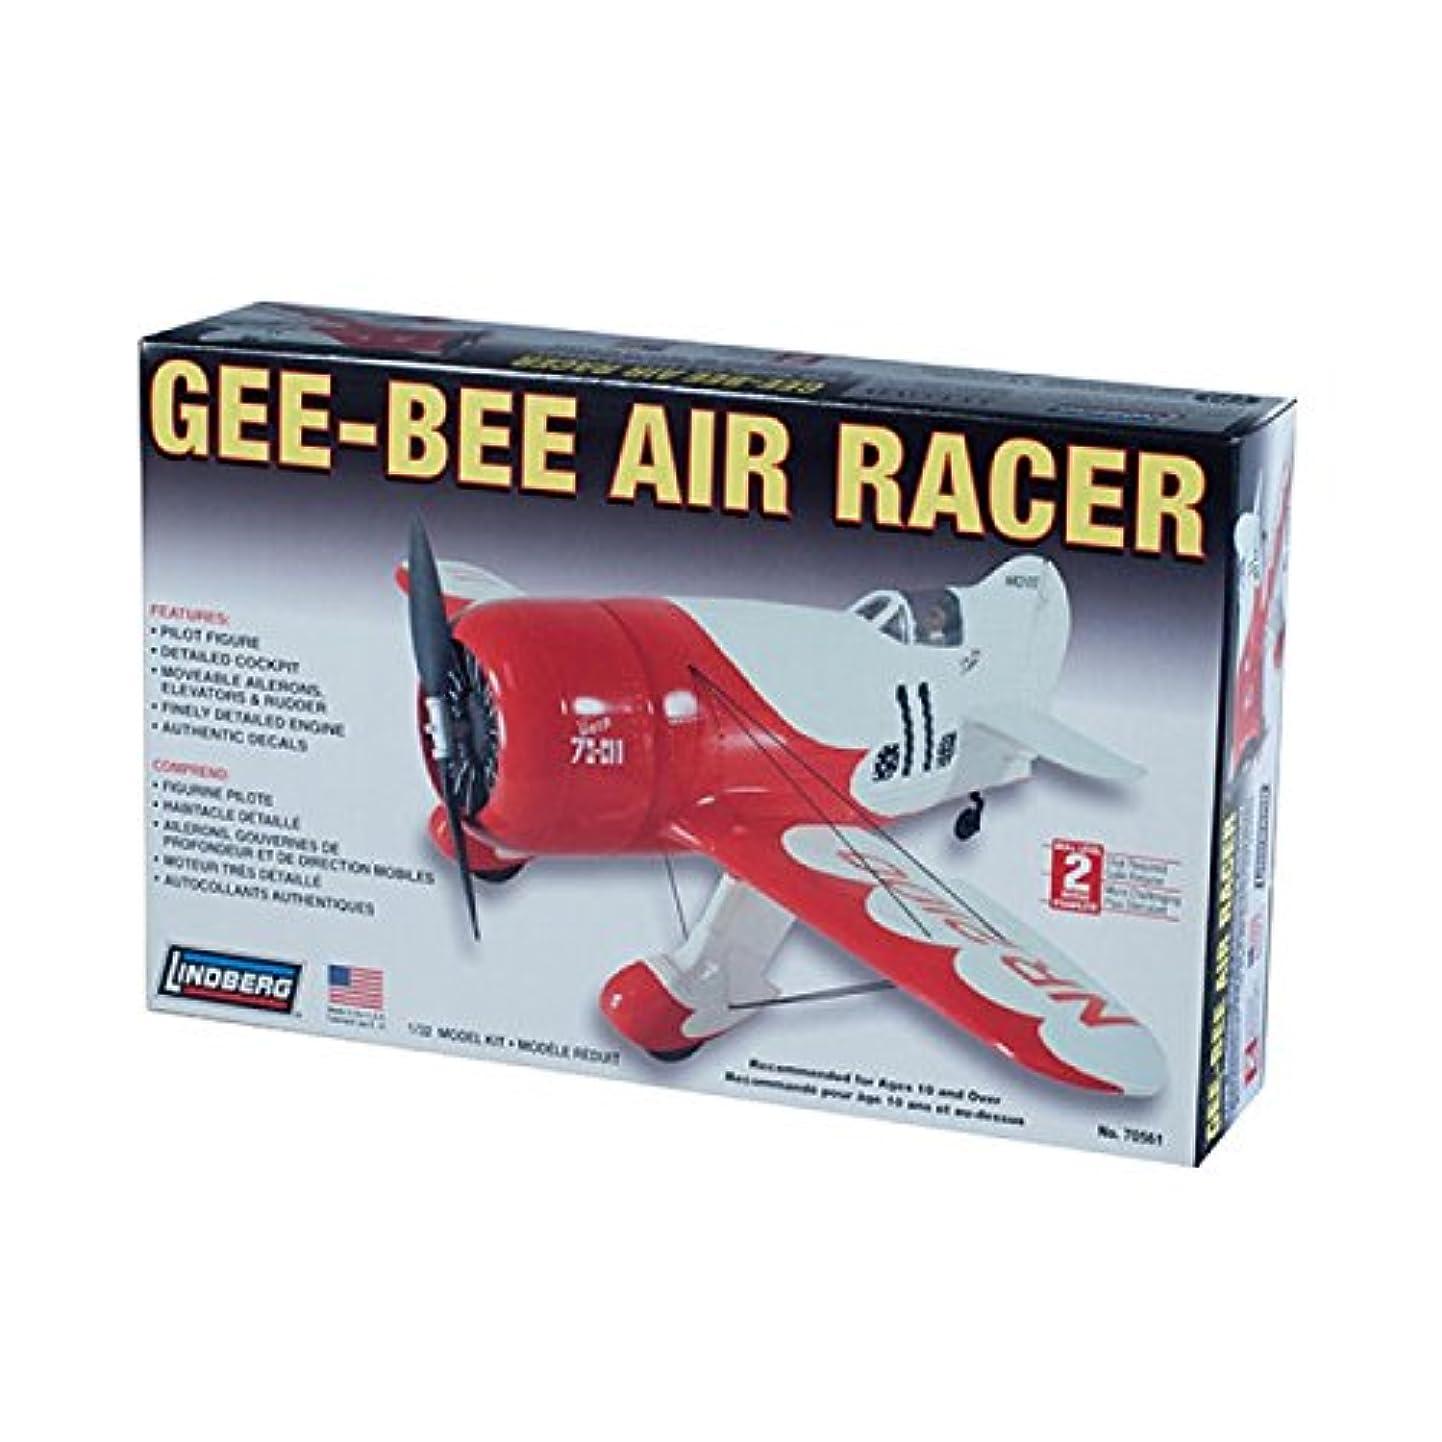 Lindberg 70561 1/32 Gee-Bee Air Racer LNDS0561 majnigiamep3